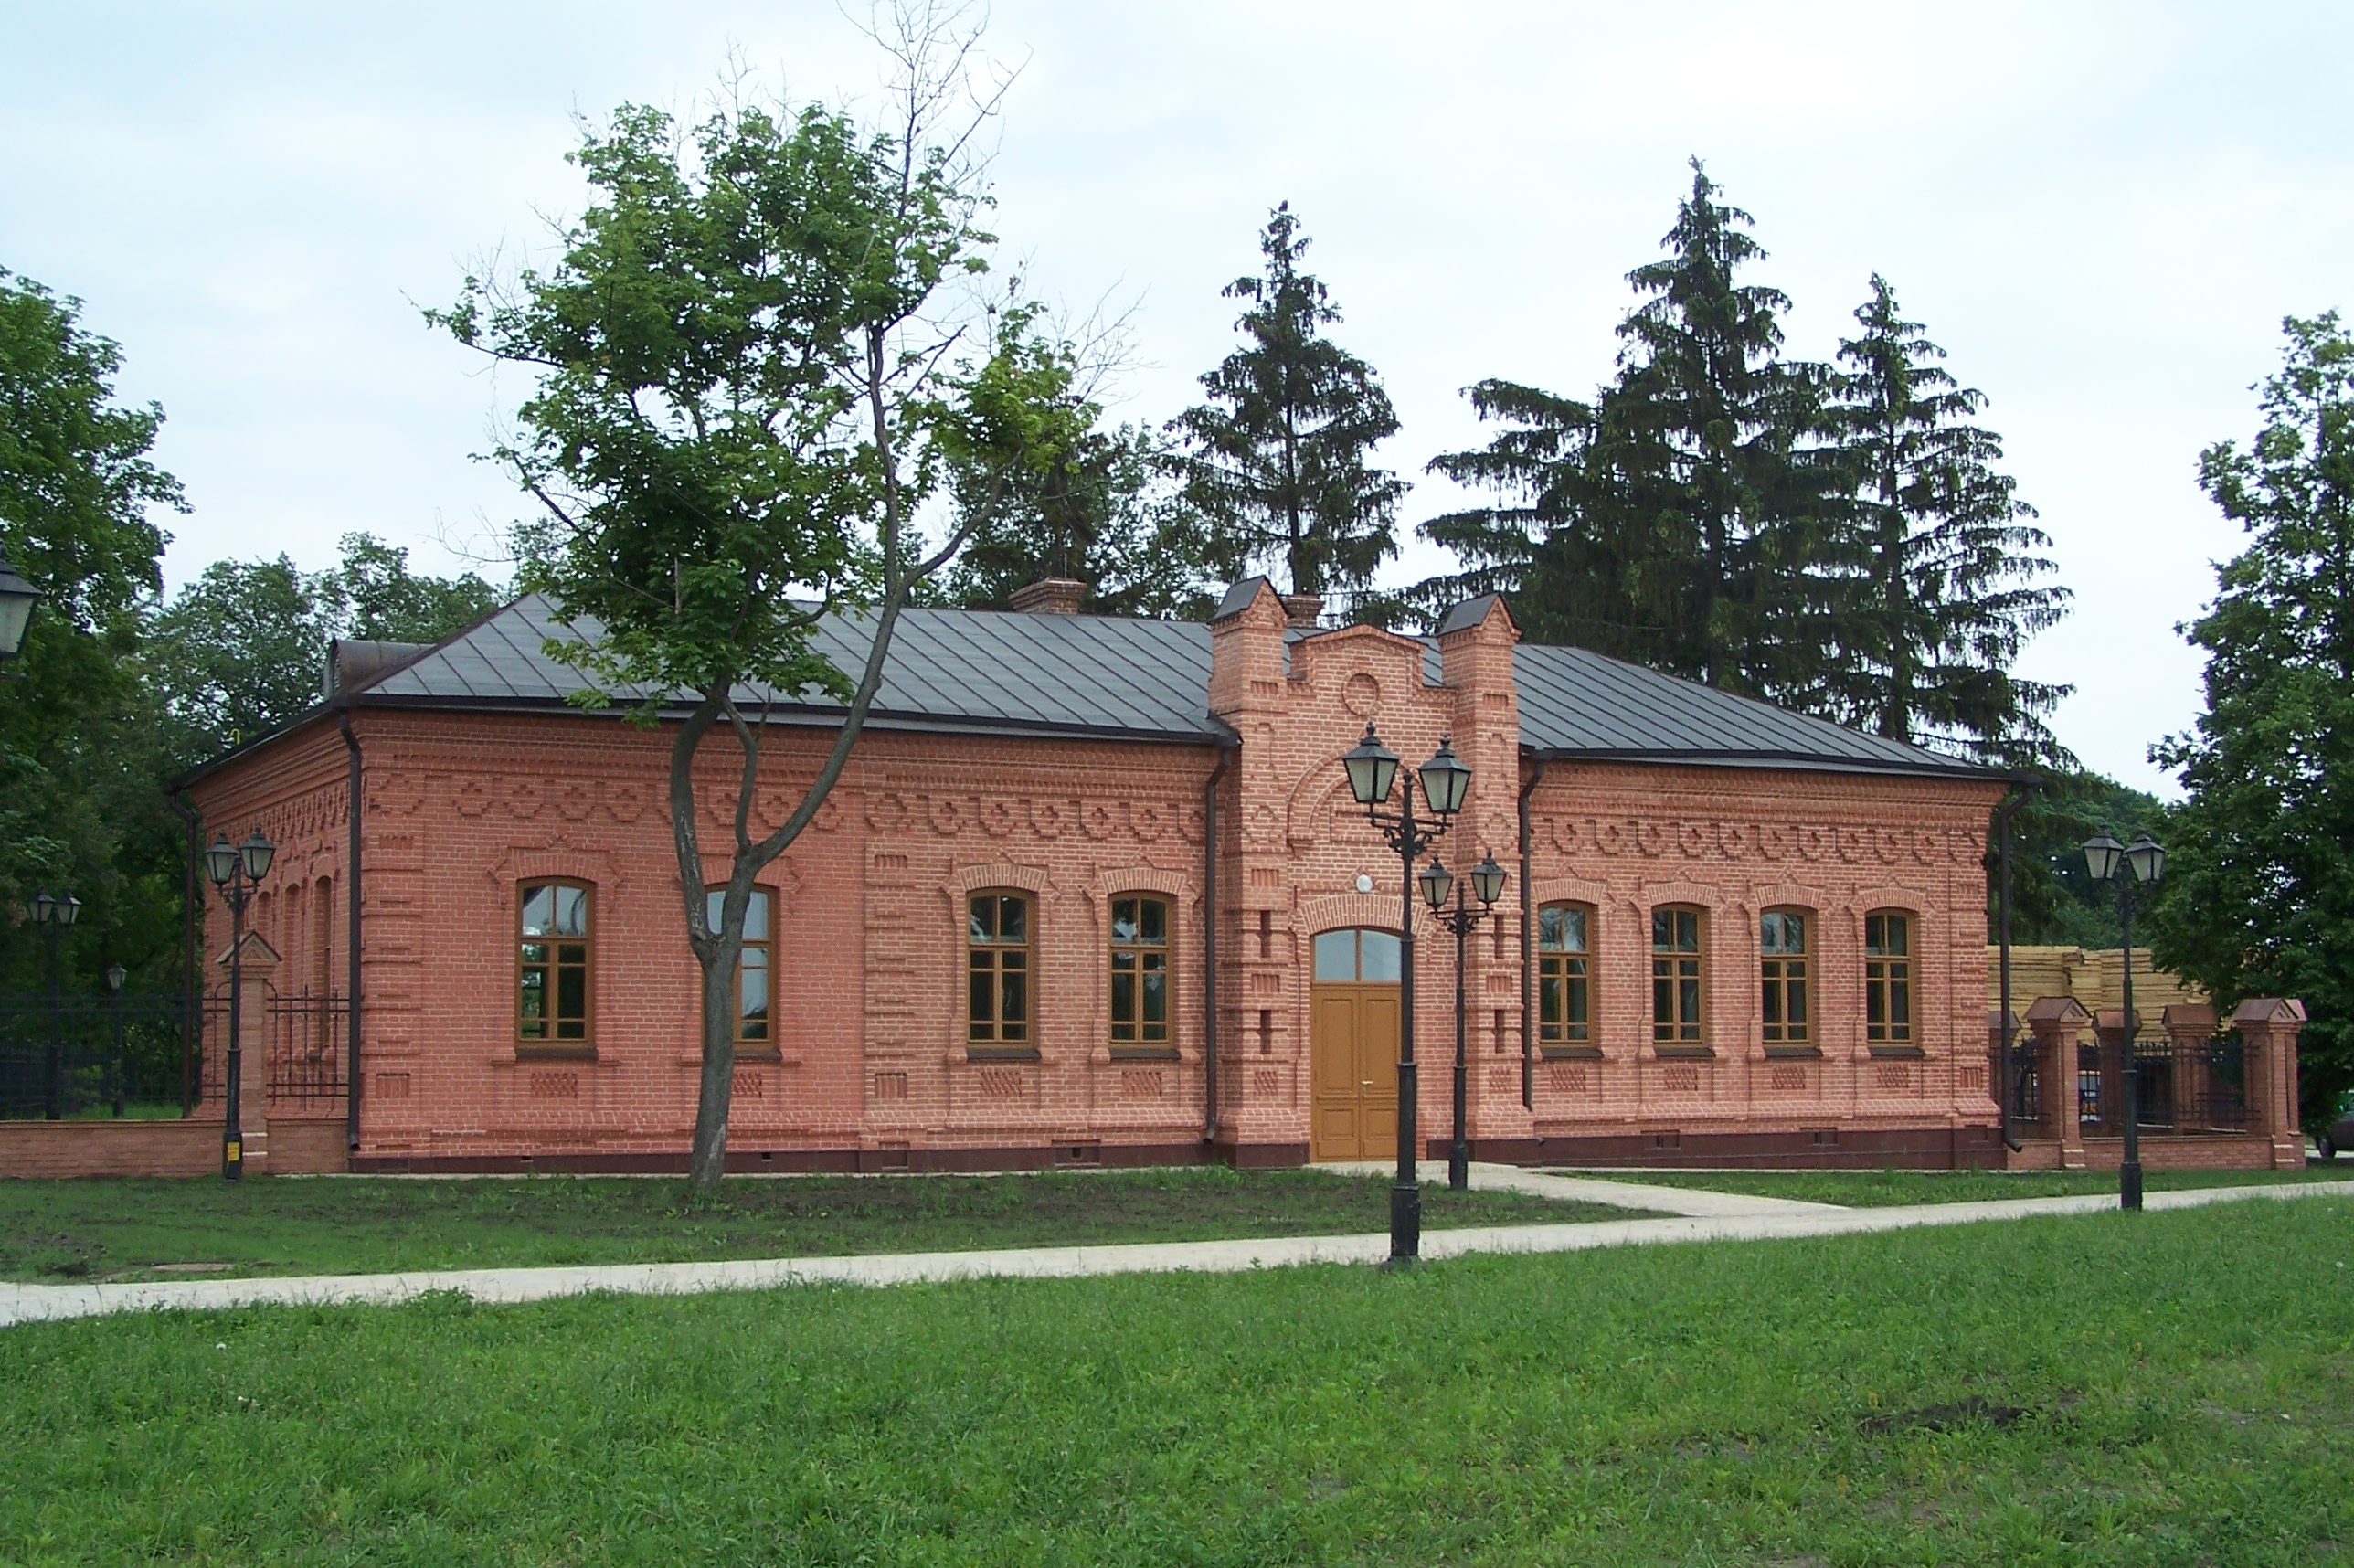 http://www.baturin-capital.gov.ua/images/stories/gga1/a1.jpg